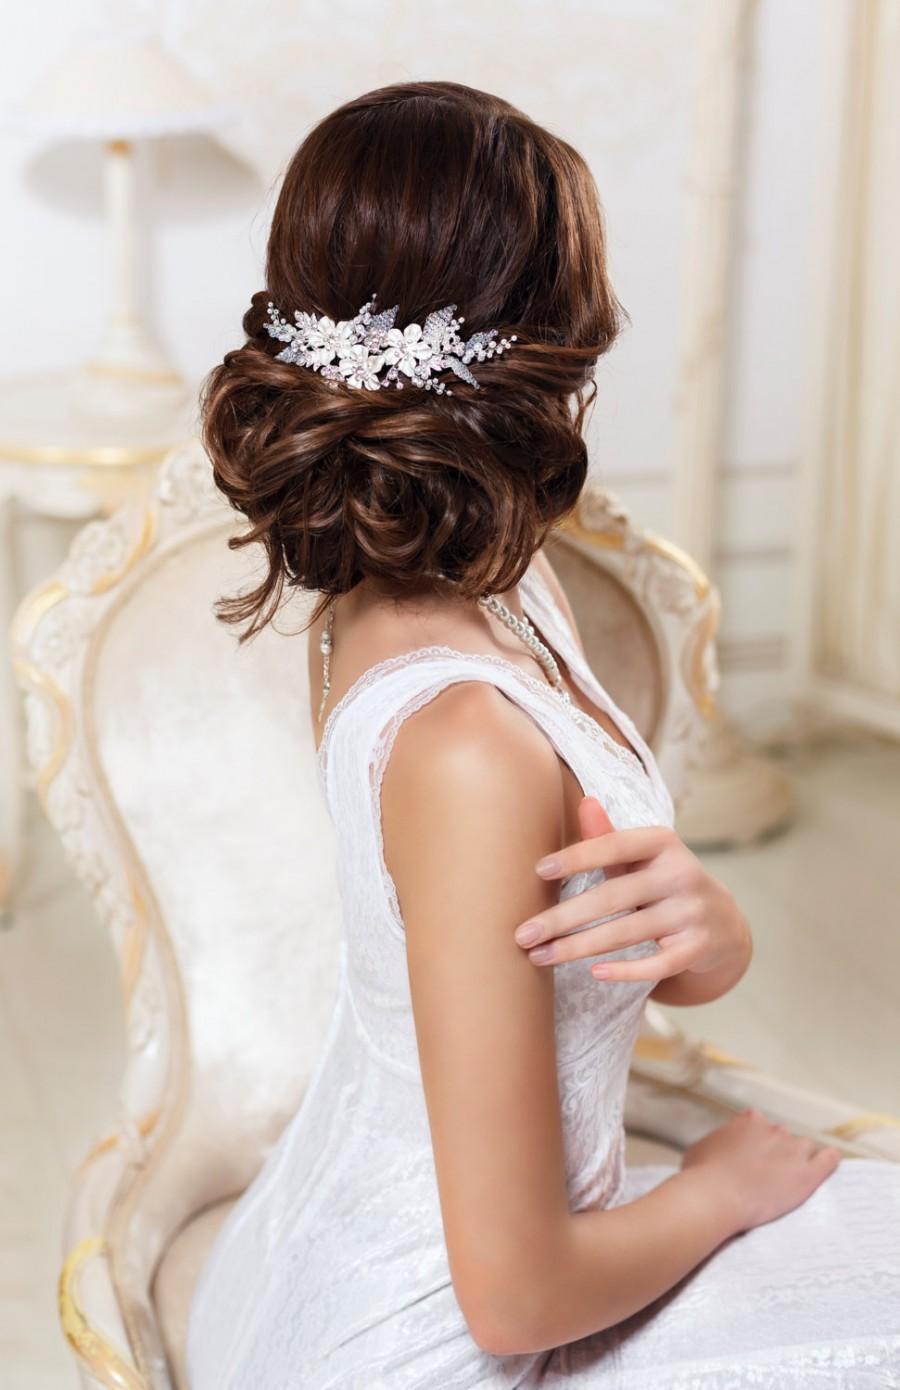 Wedding - Bridal hair comb Wedding hair comb Bridal headpiece Bridal hair accessories Wedding headpiece Bridal hairpiece Bridal comb Wedding comb